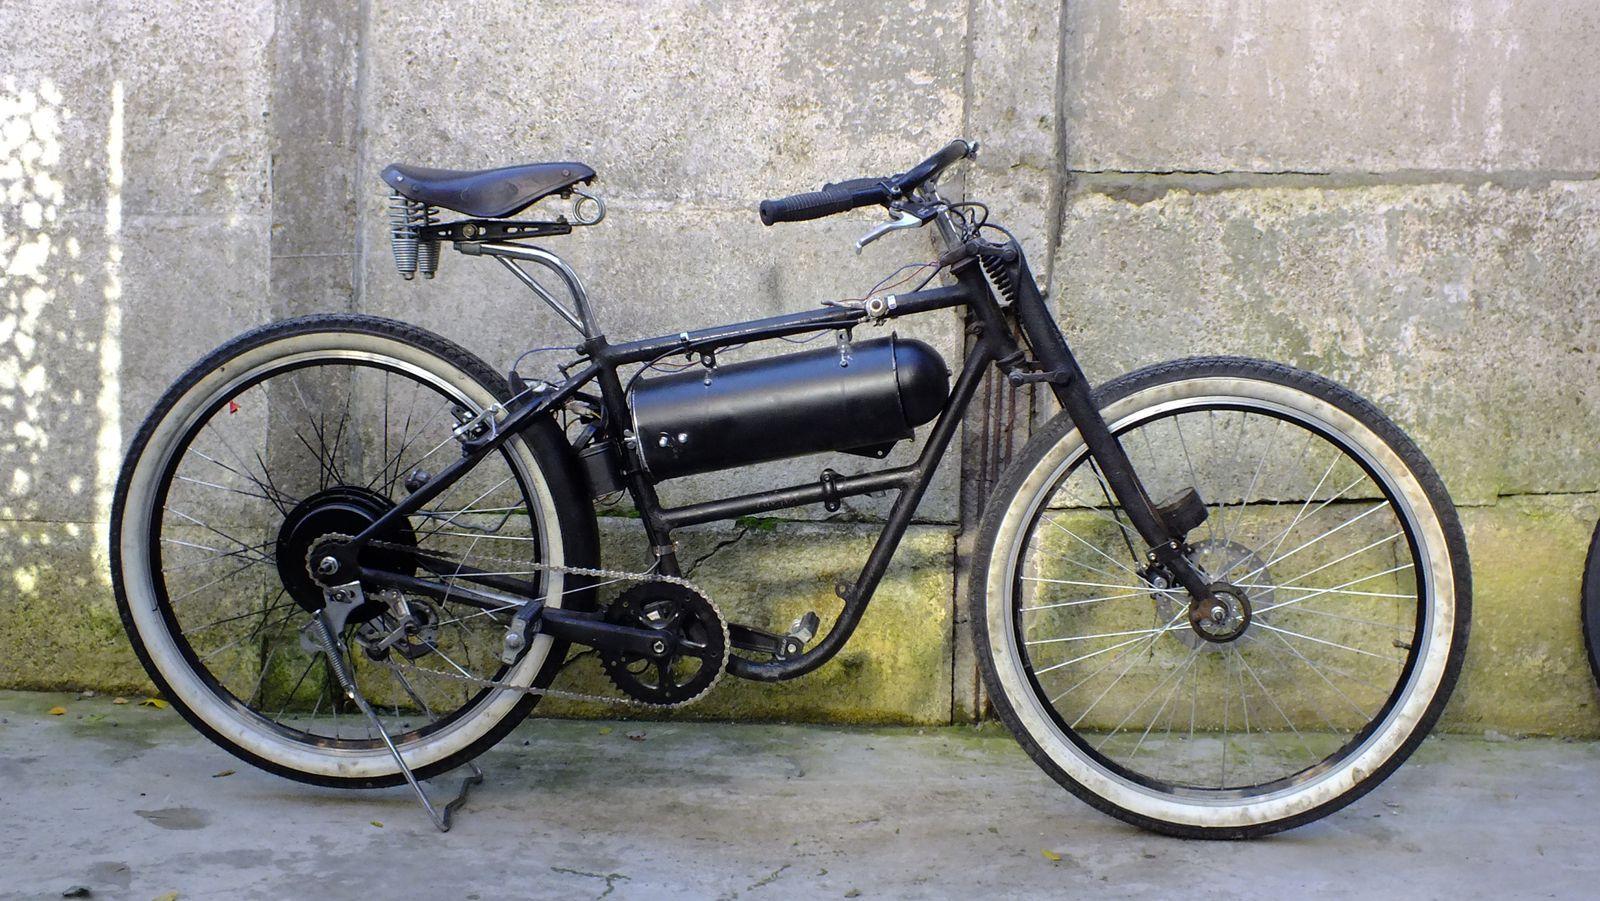 Bicicleta eléctrica a partir de moto Guzzi (+sidecar??) DSCF8459